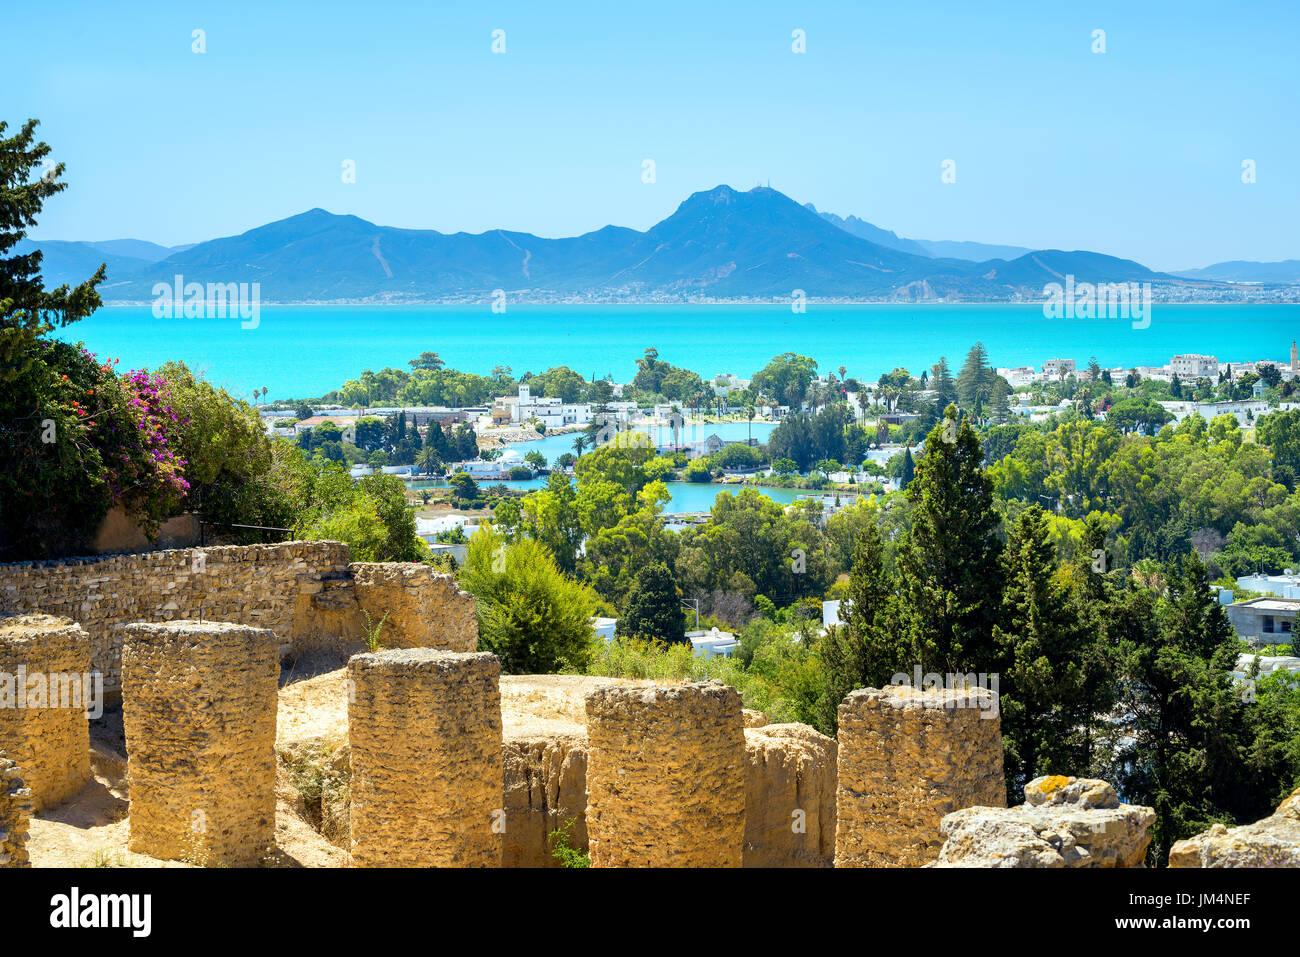 Paisaje con ruinas de Cartago. Túnez, Túnez, África Imagen De Stock